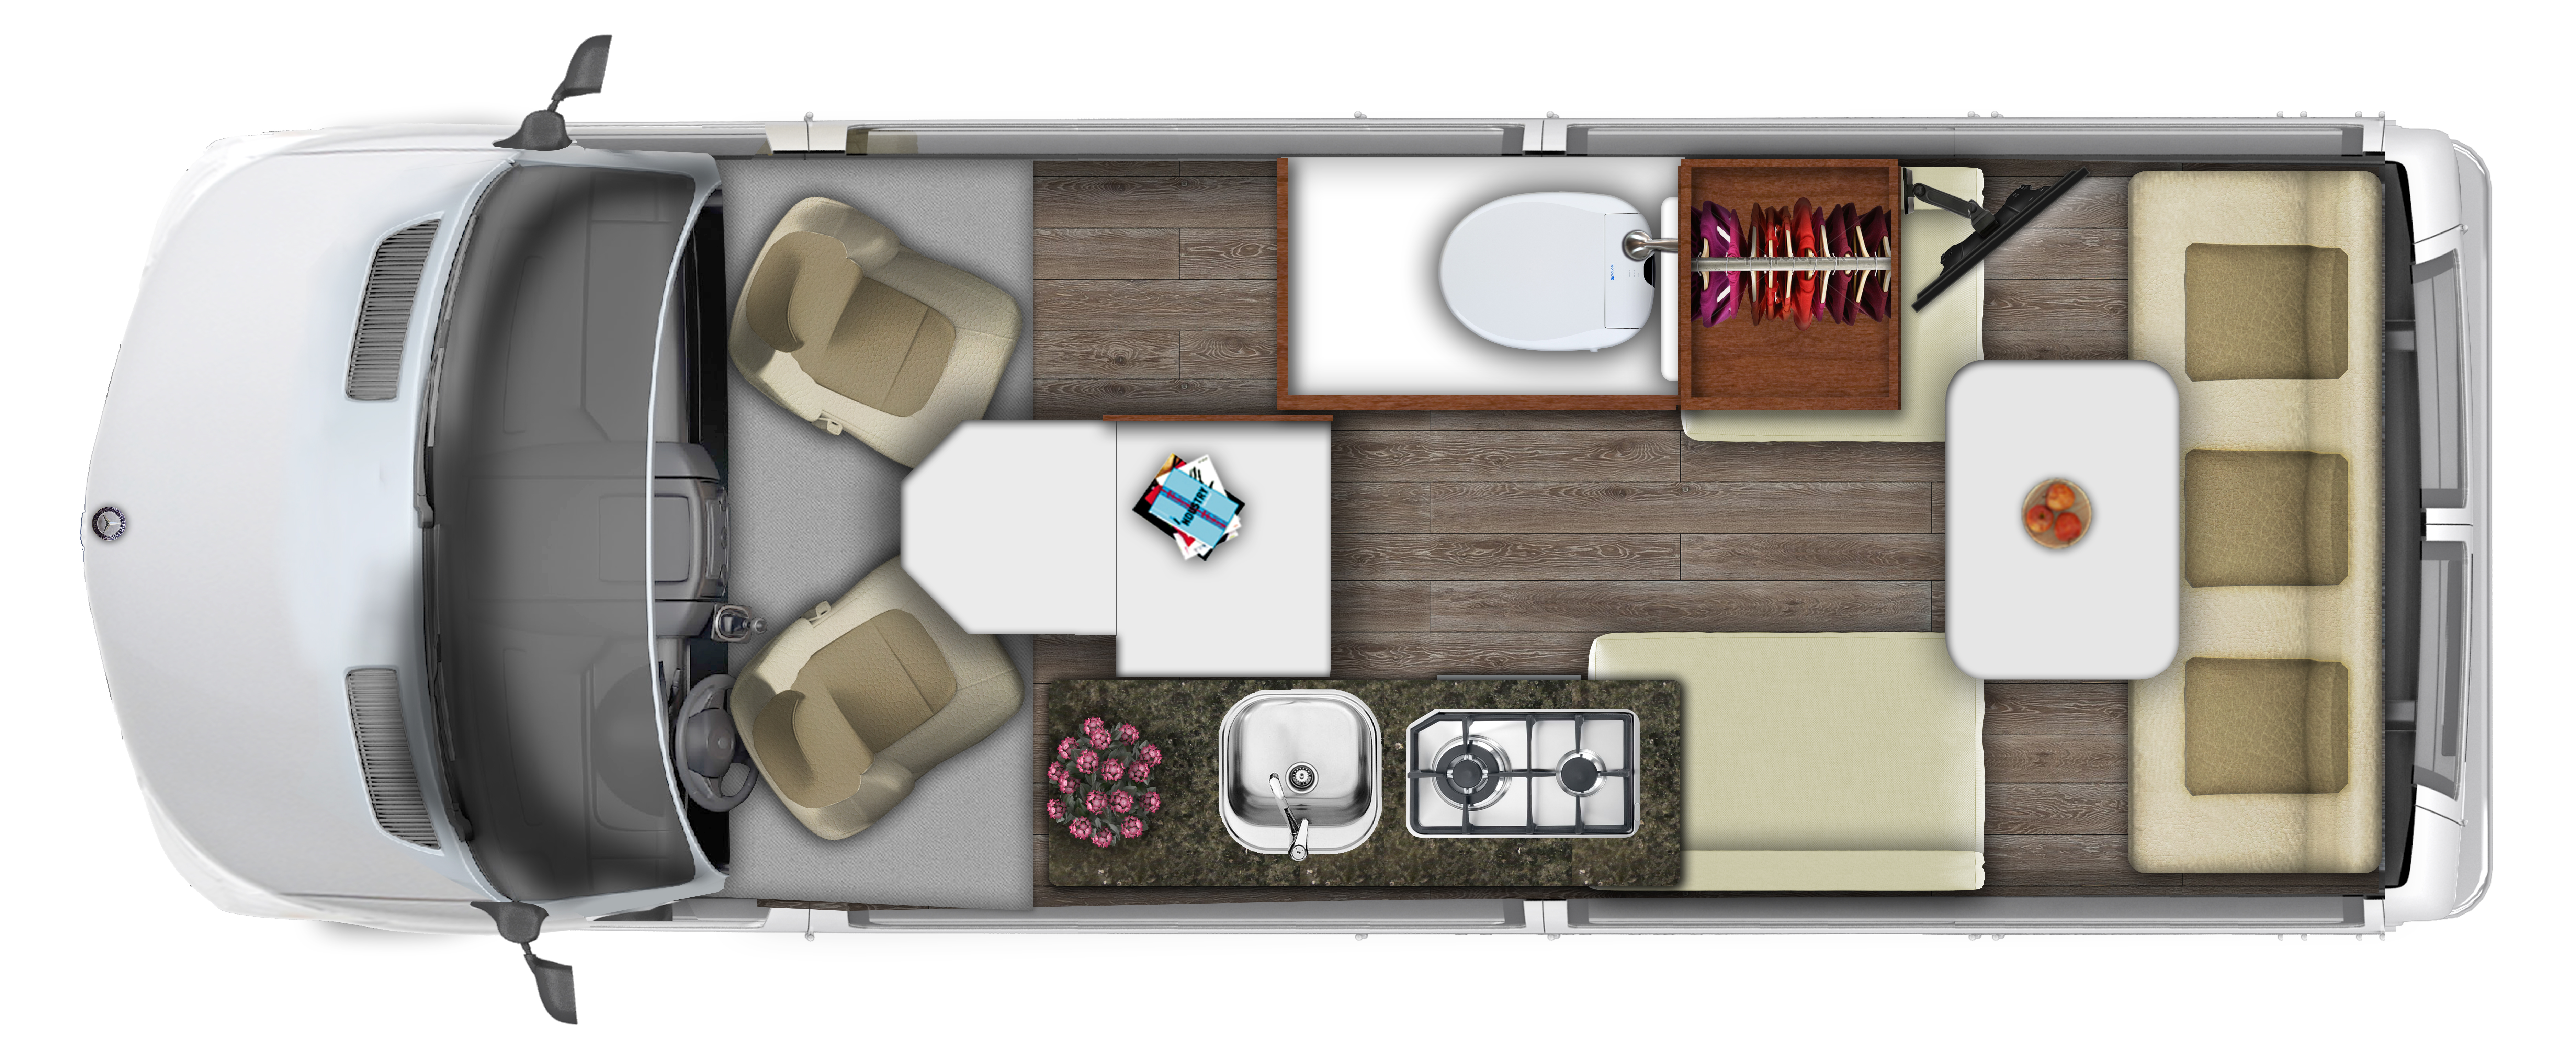 Split twin floor plan. Roadtrek Agile Ss 2017